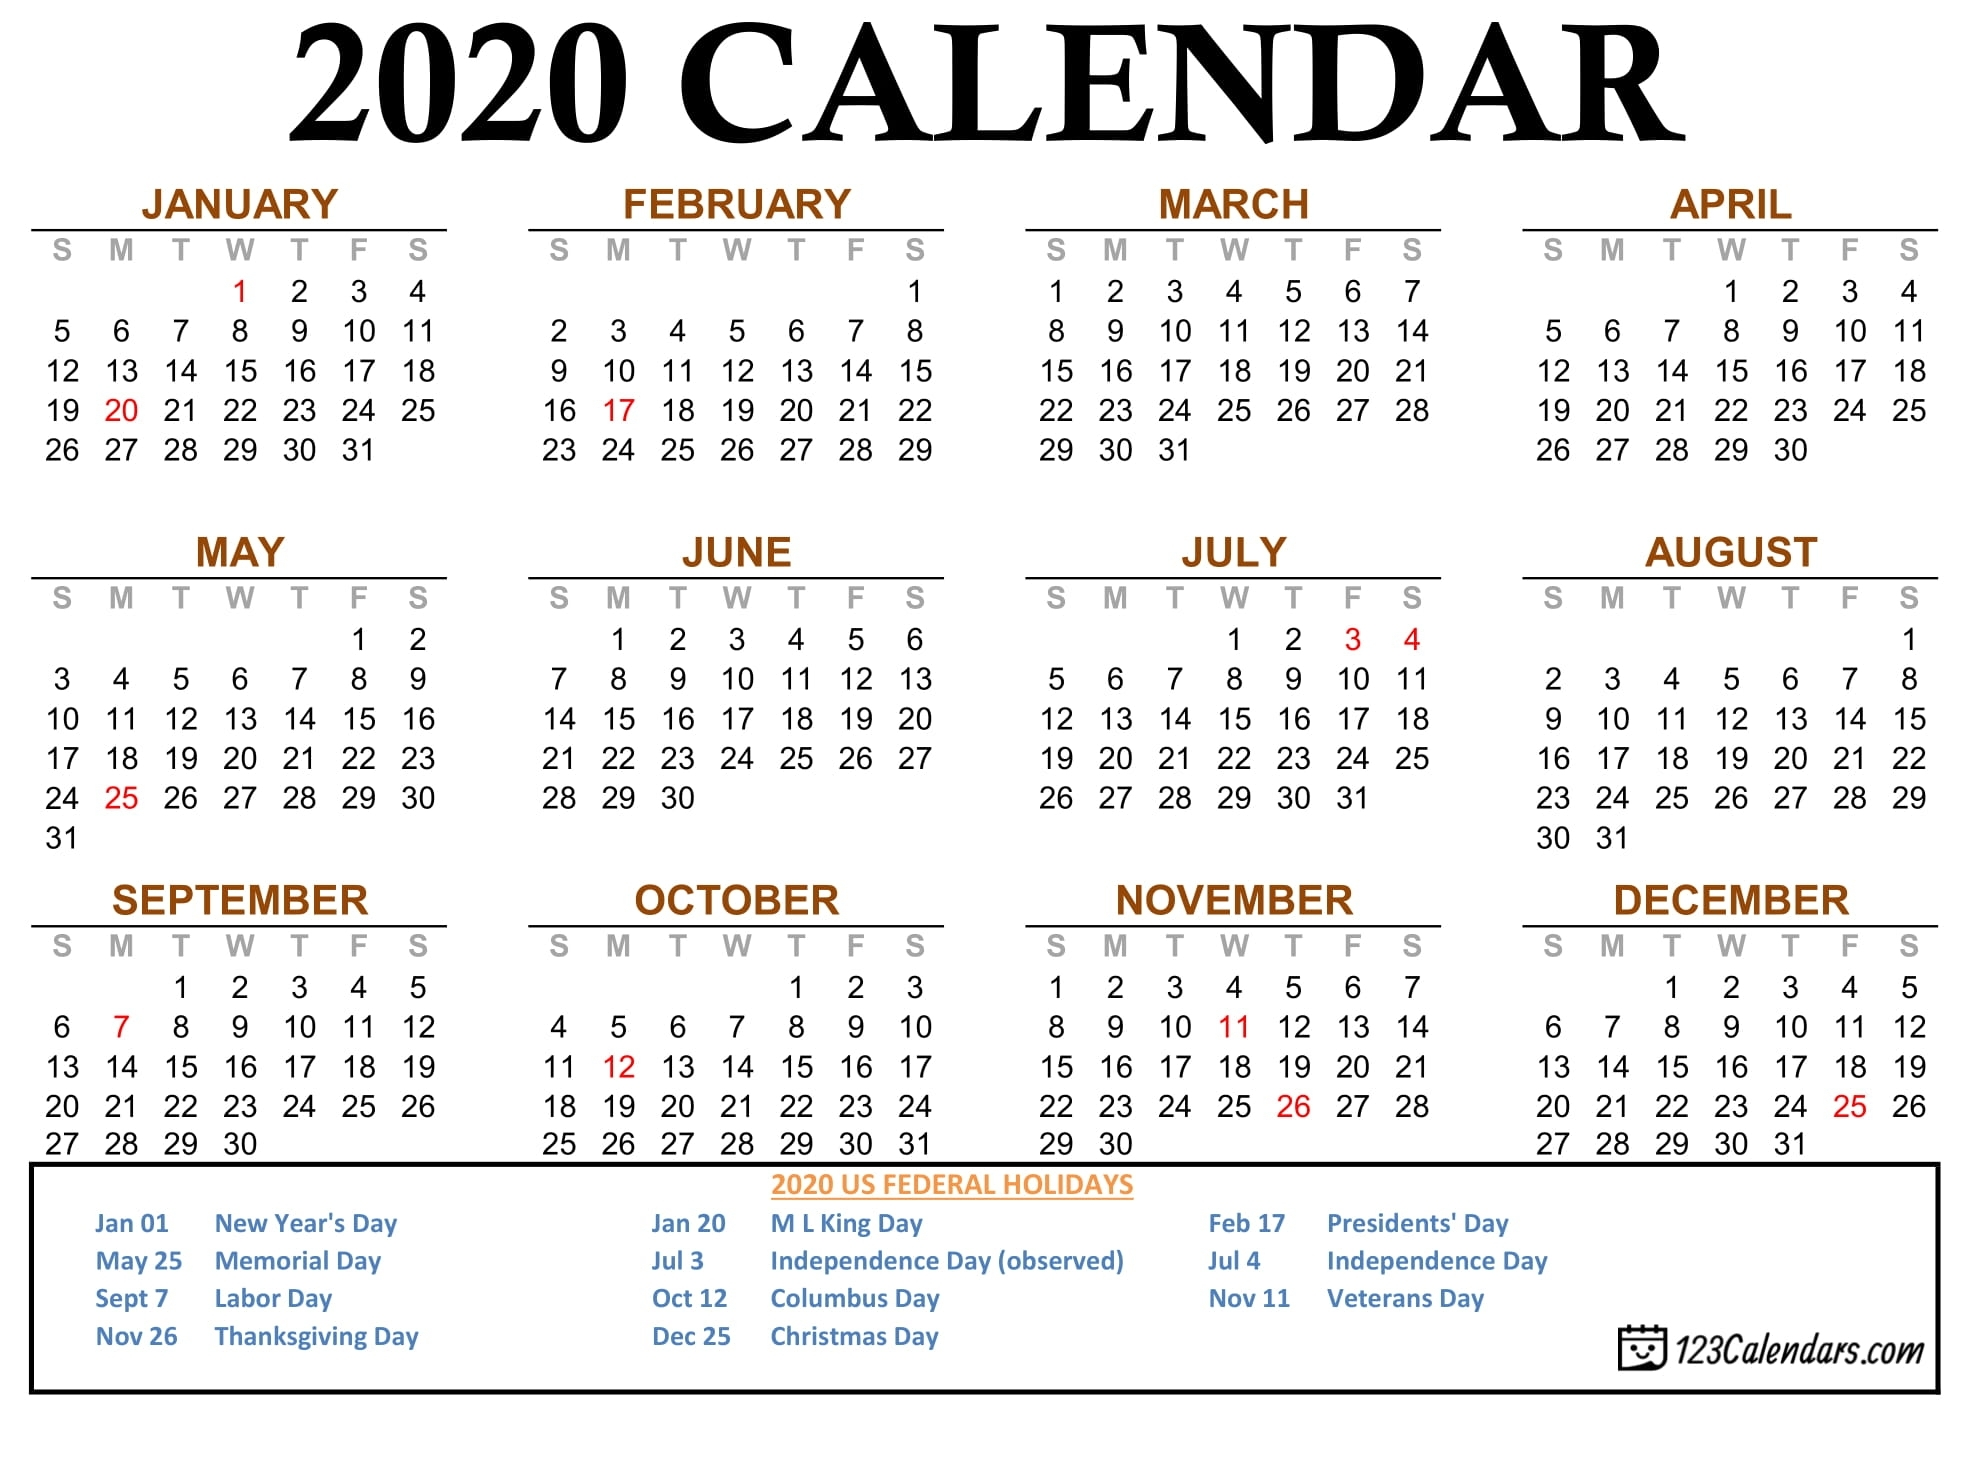 Free Printable 2020 Calendar | 123Calendars in 2020 Pocket Size Calendar Free